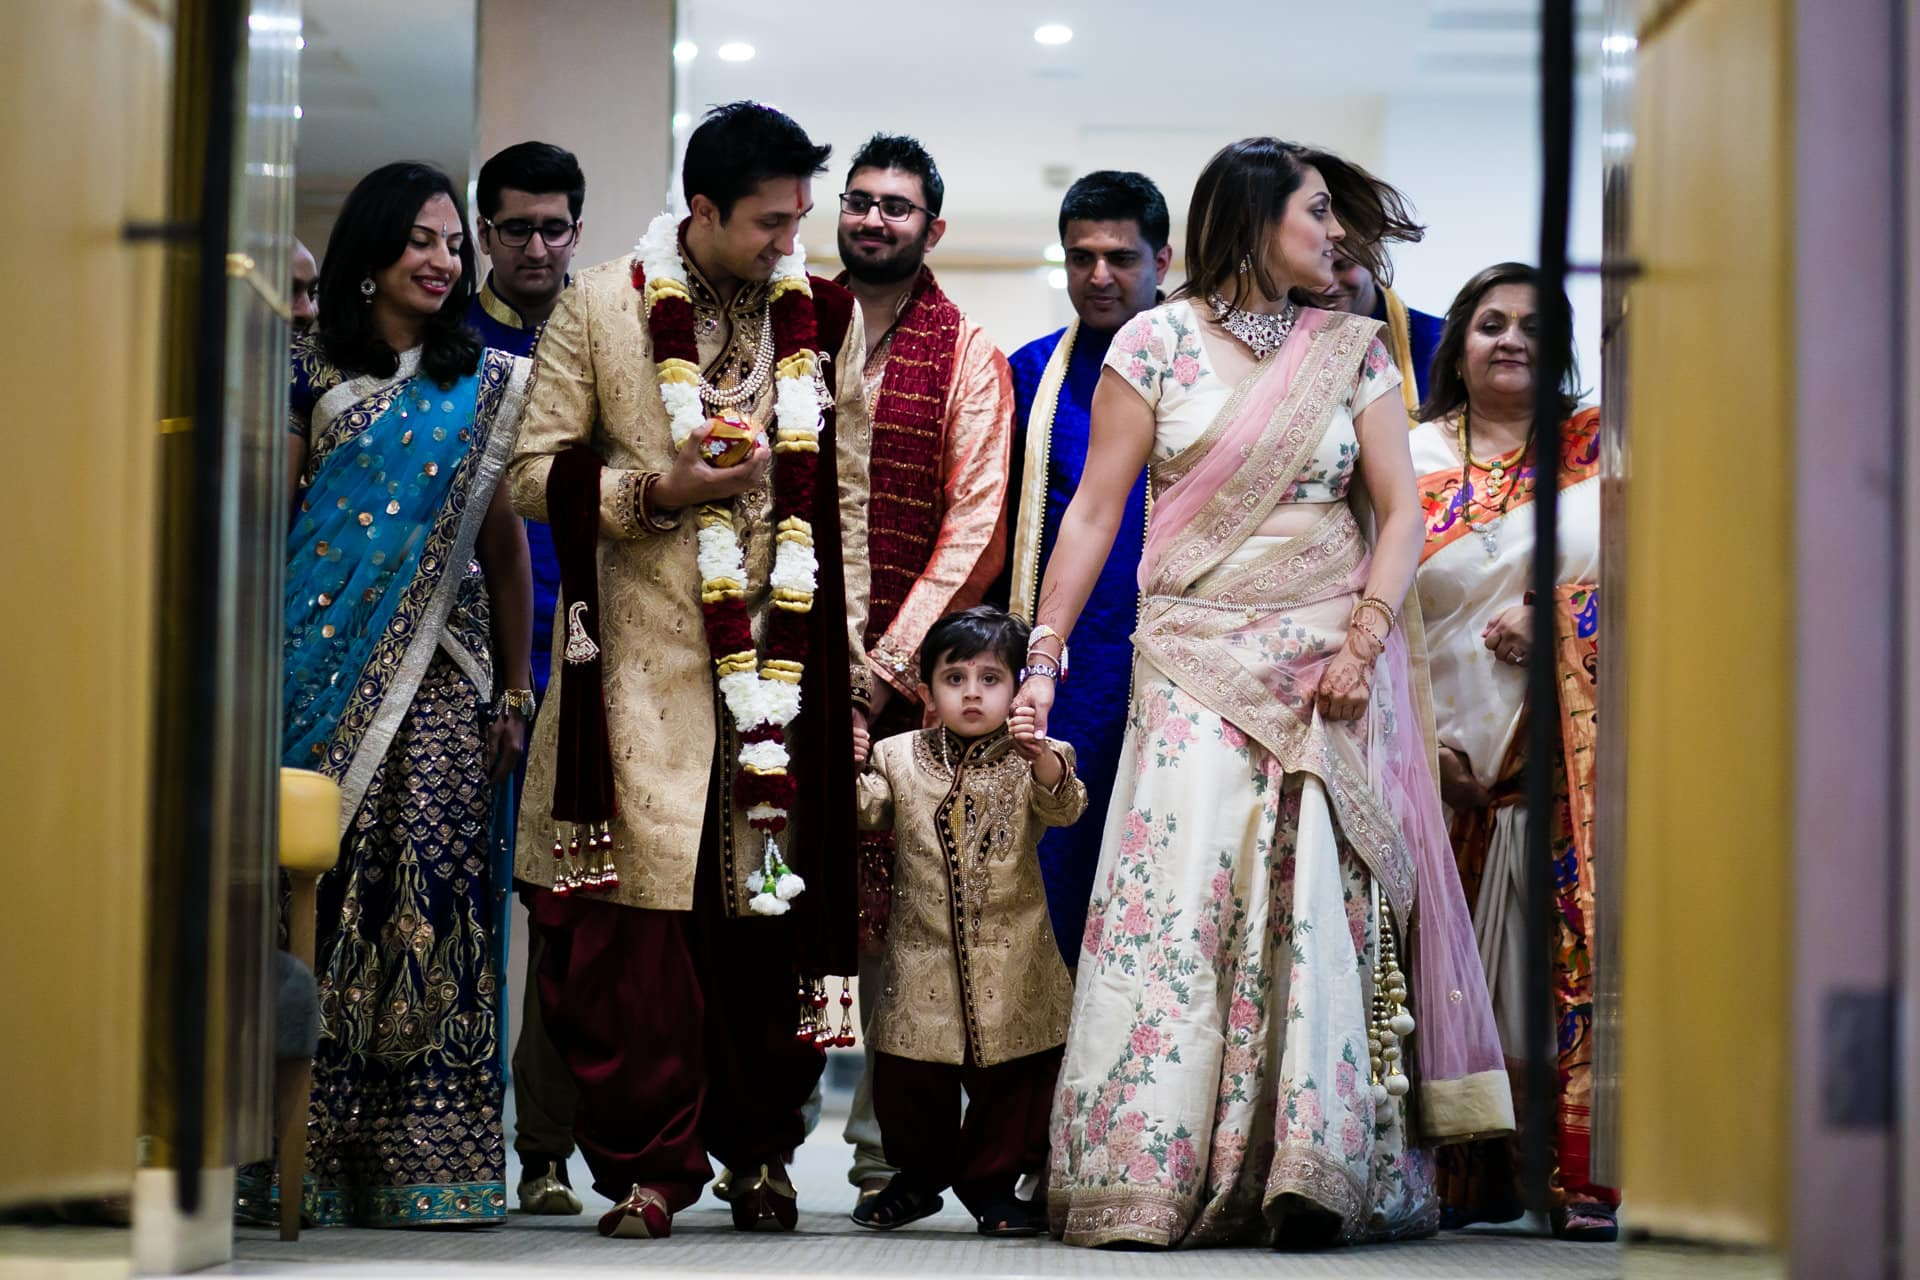 Hindu Wedding Groom waiting with family